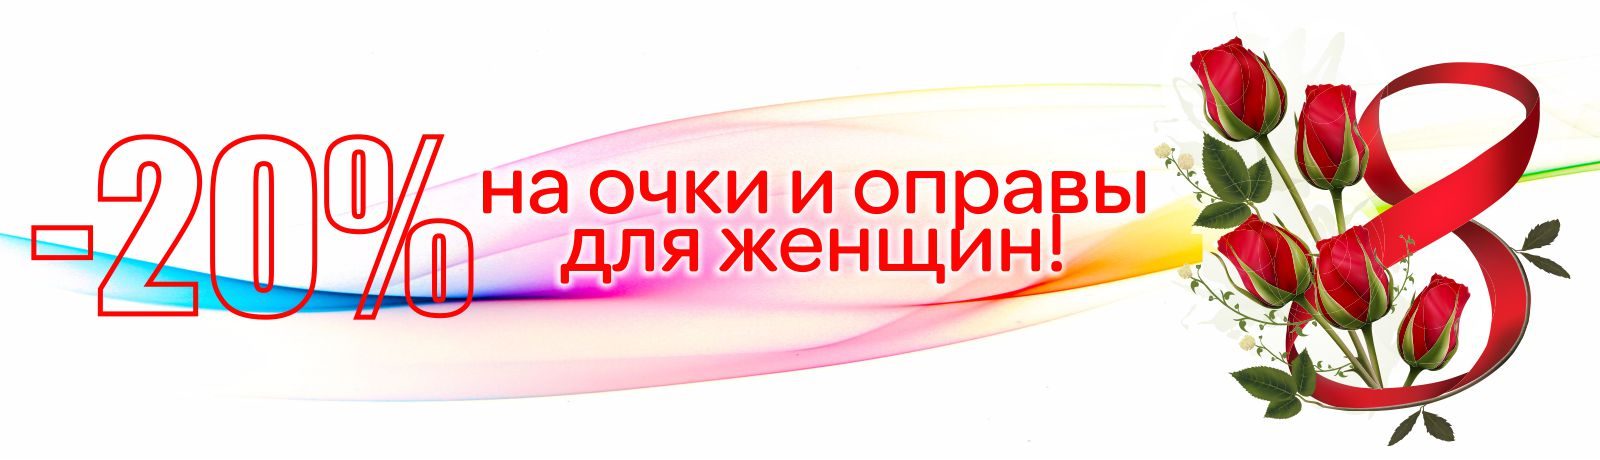 ... Ремонт очков Ray-Ban в Москве · Скидки с 2 по 8 марта bbe14b5609e4f